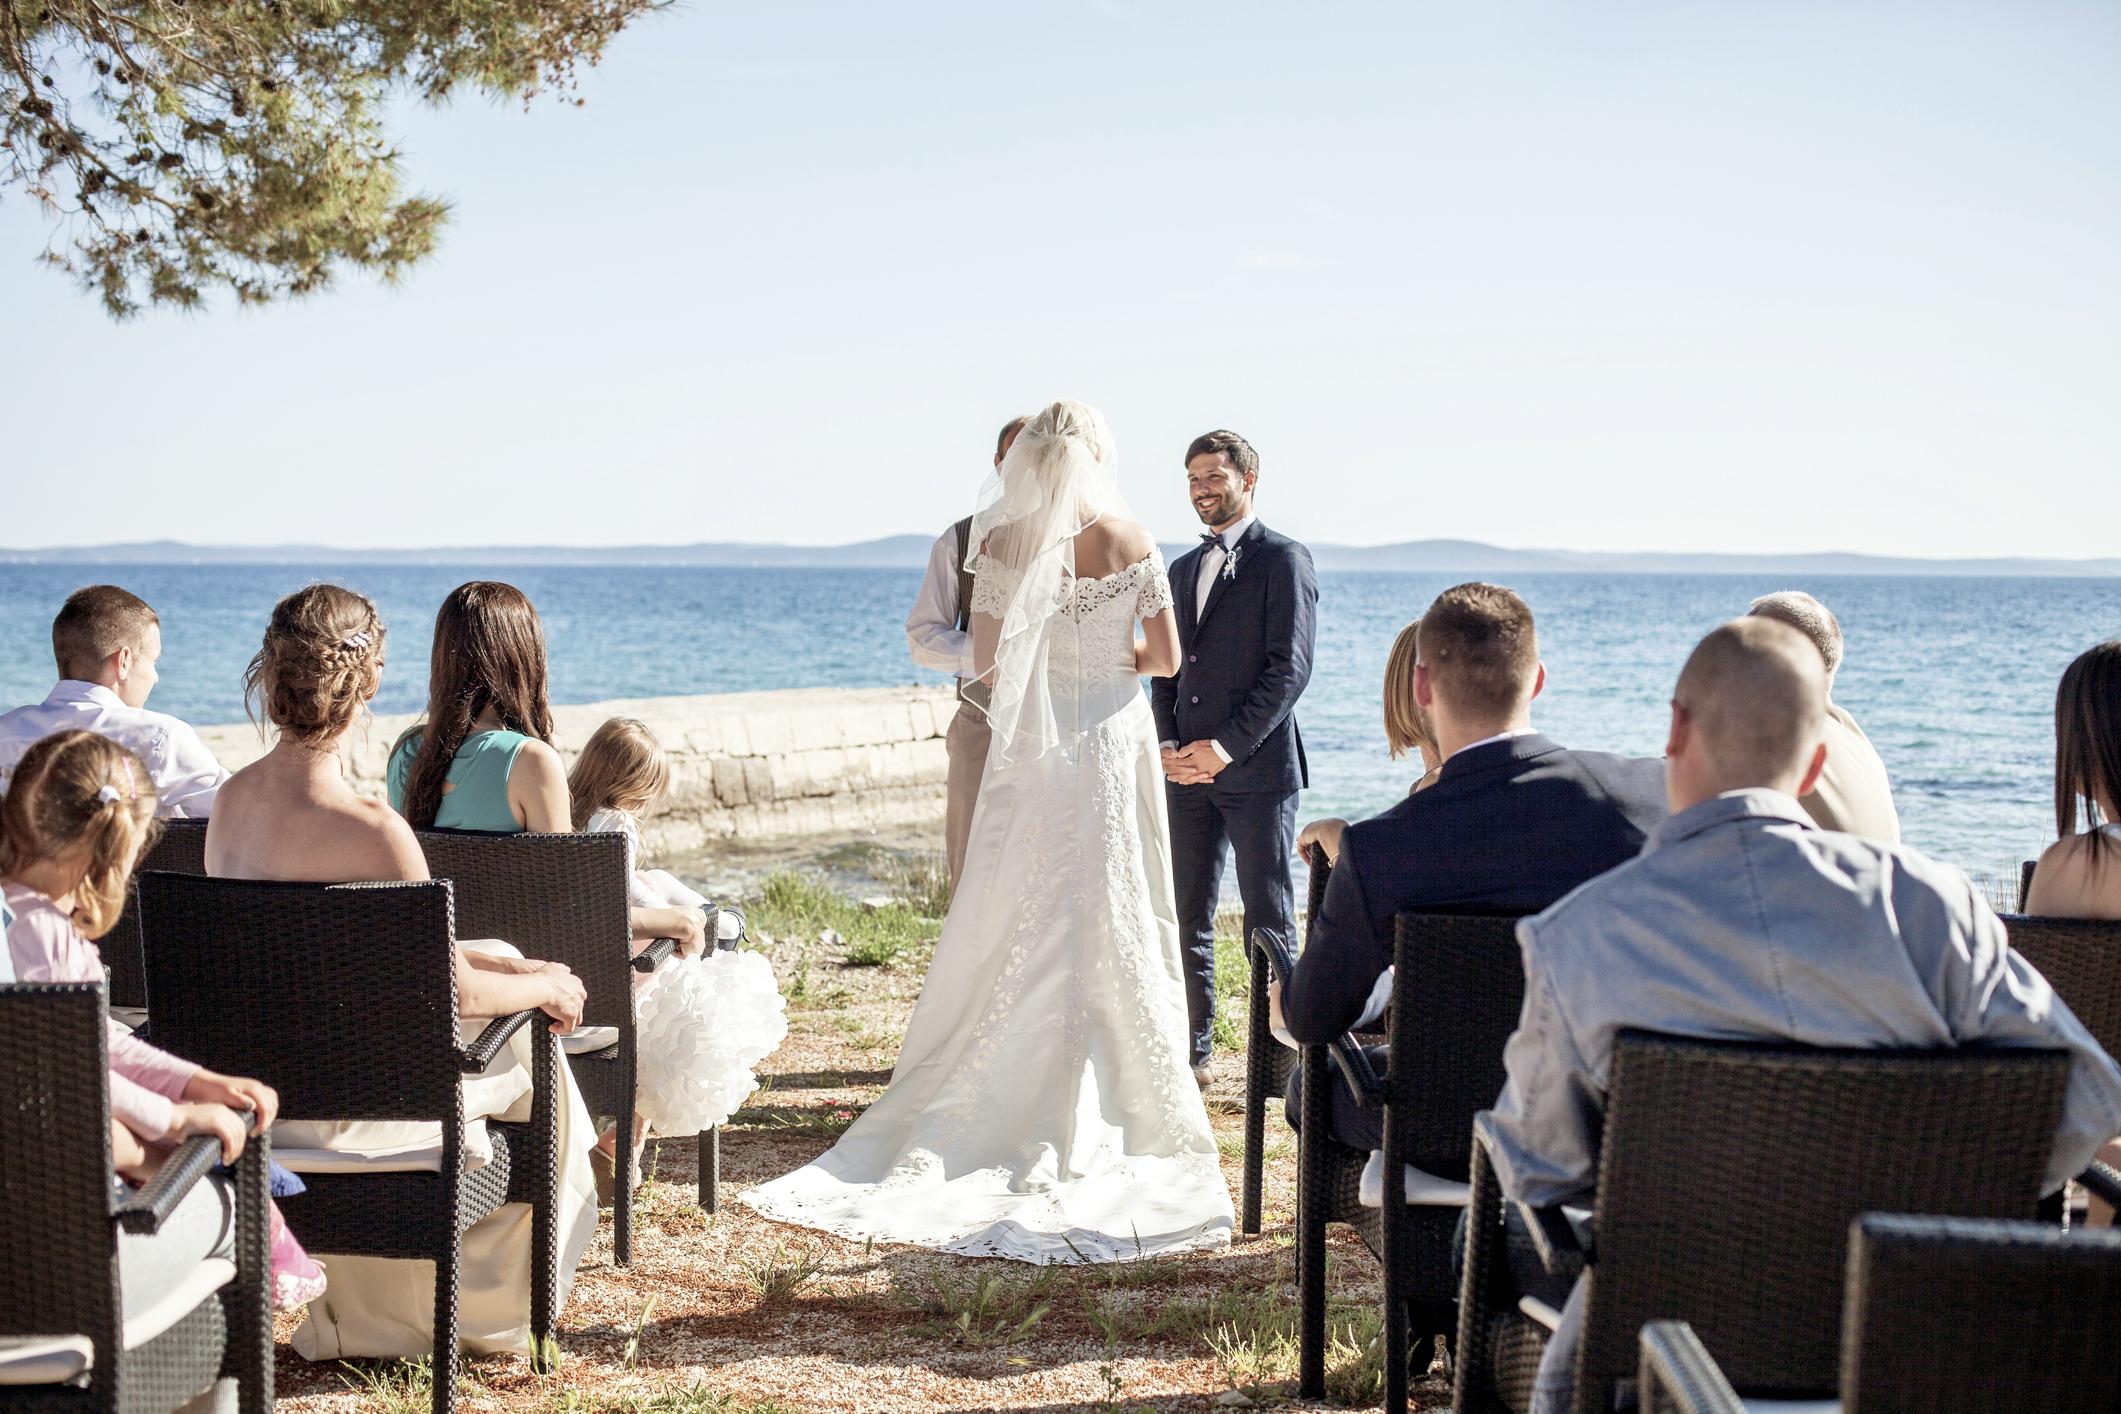 Wedding Seating Etiquette Lovetoknow